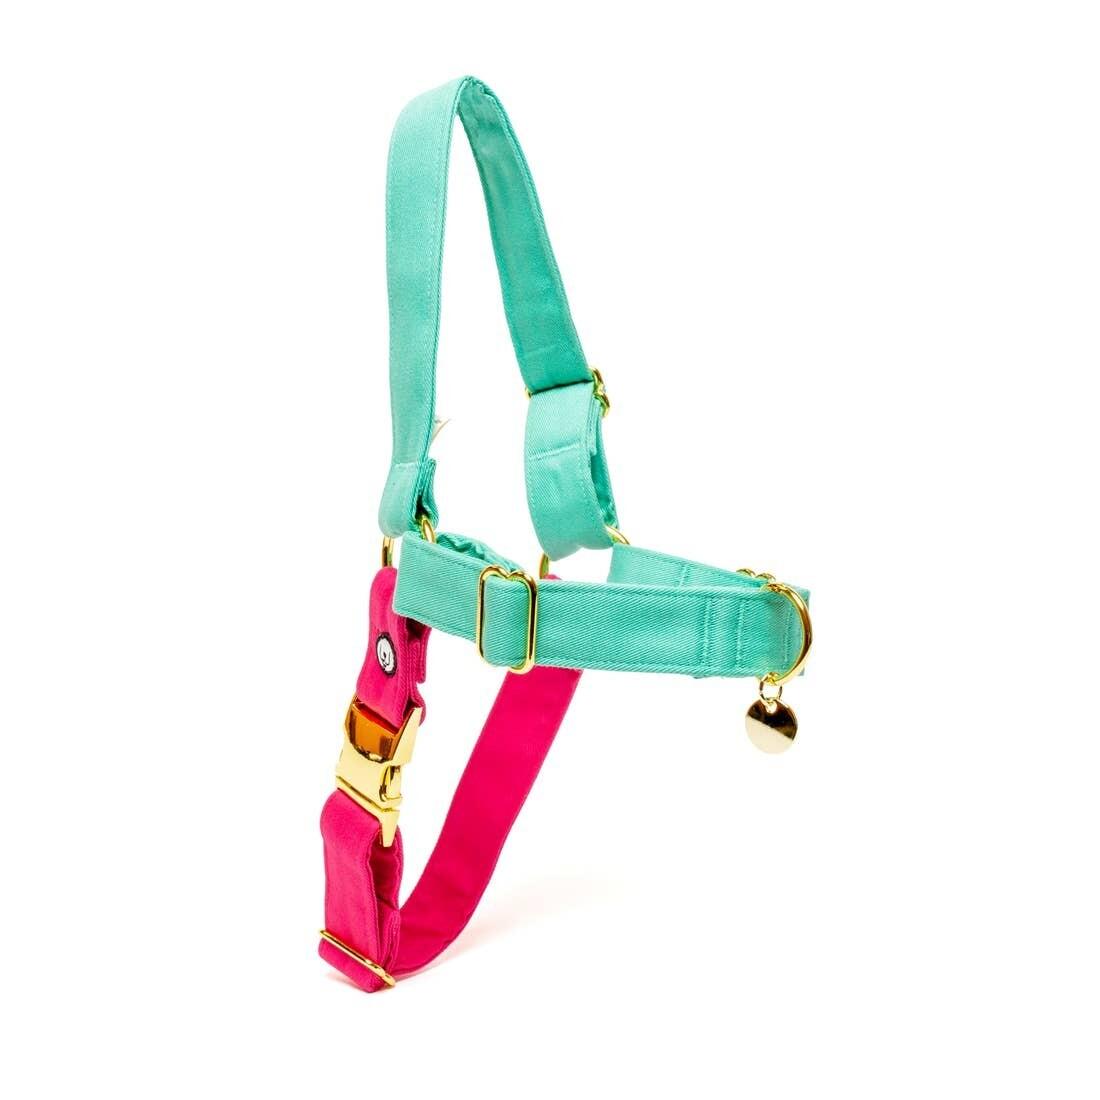 Pink Seafoam No-Pull Harness - EPW